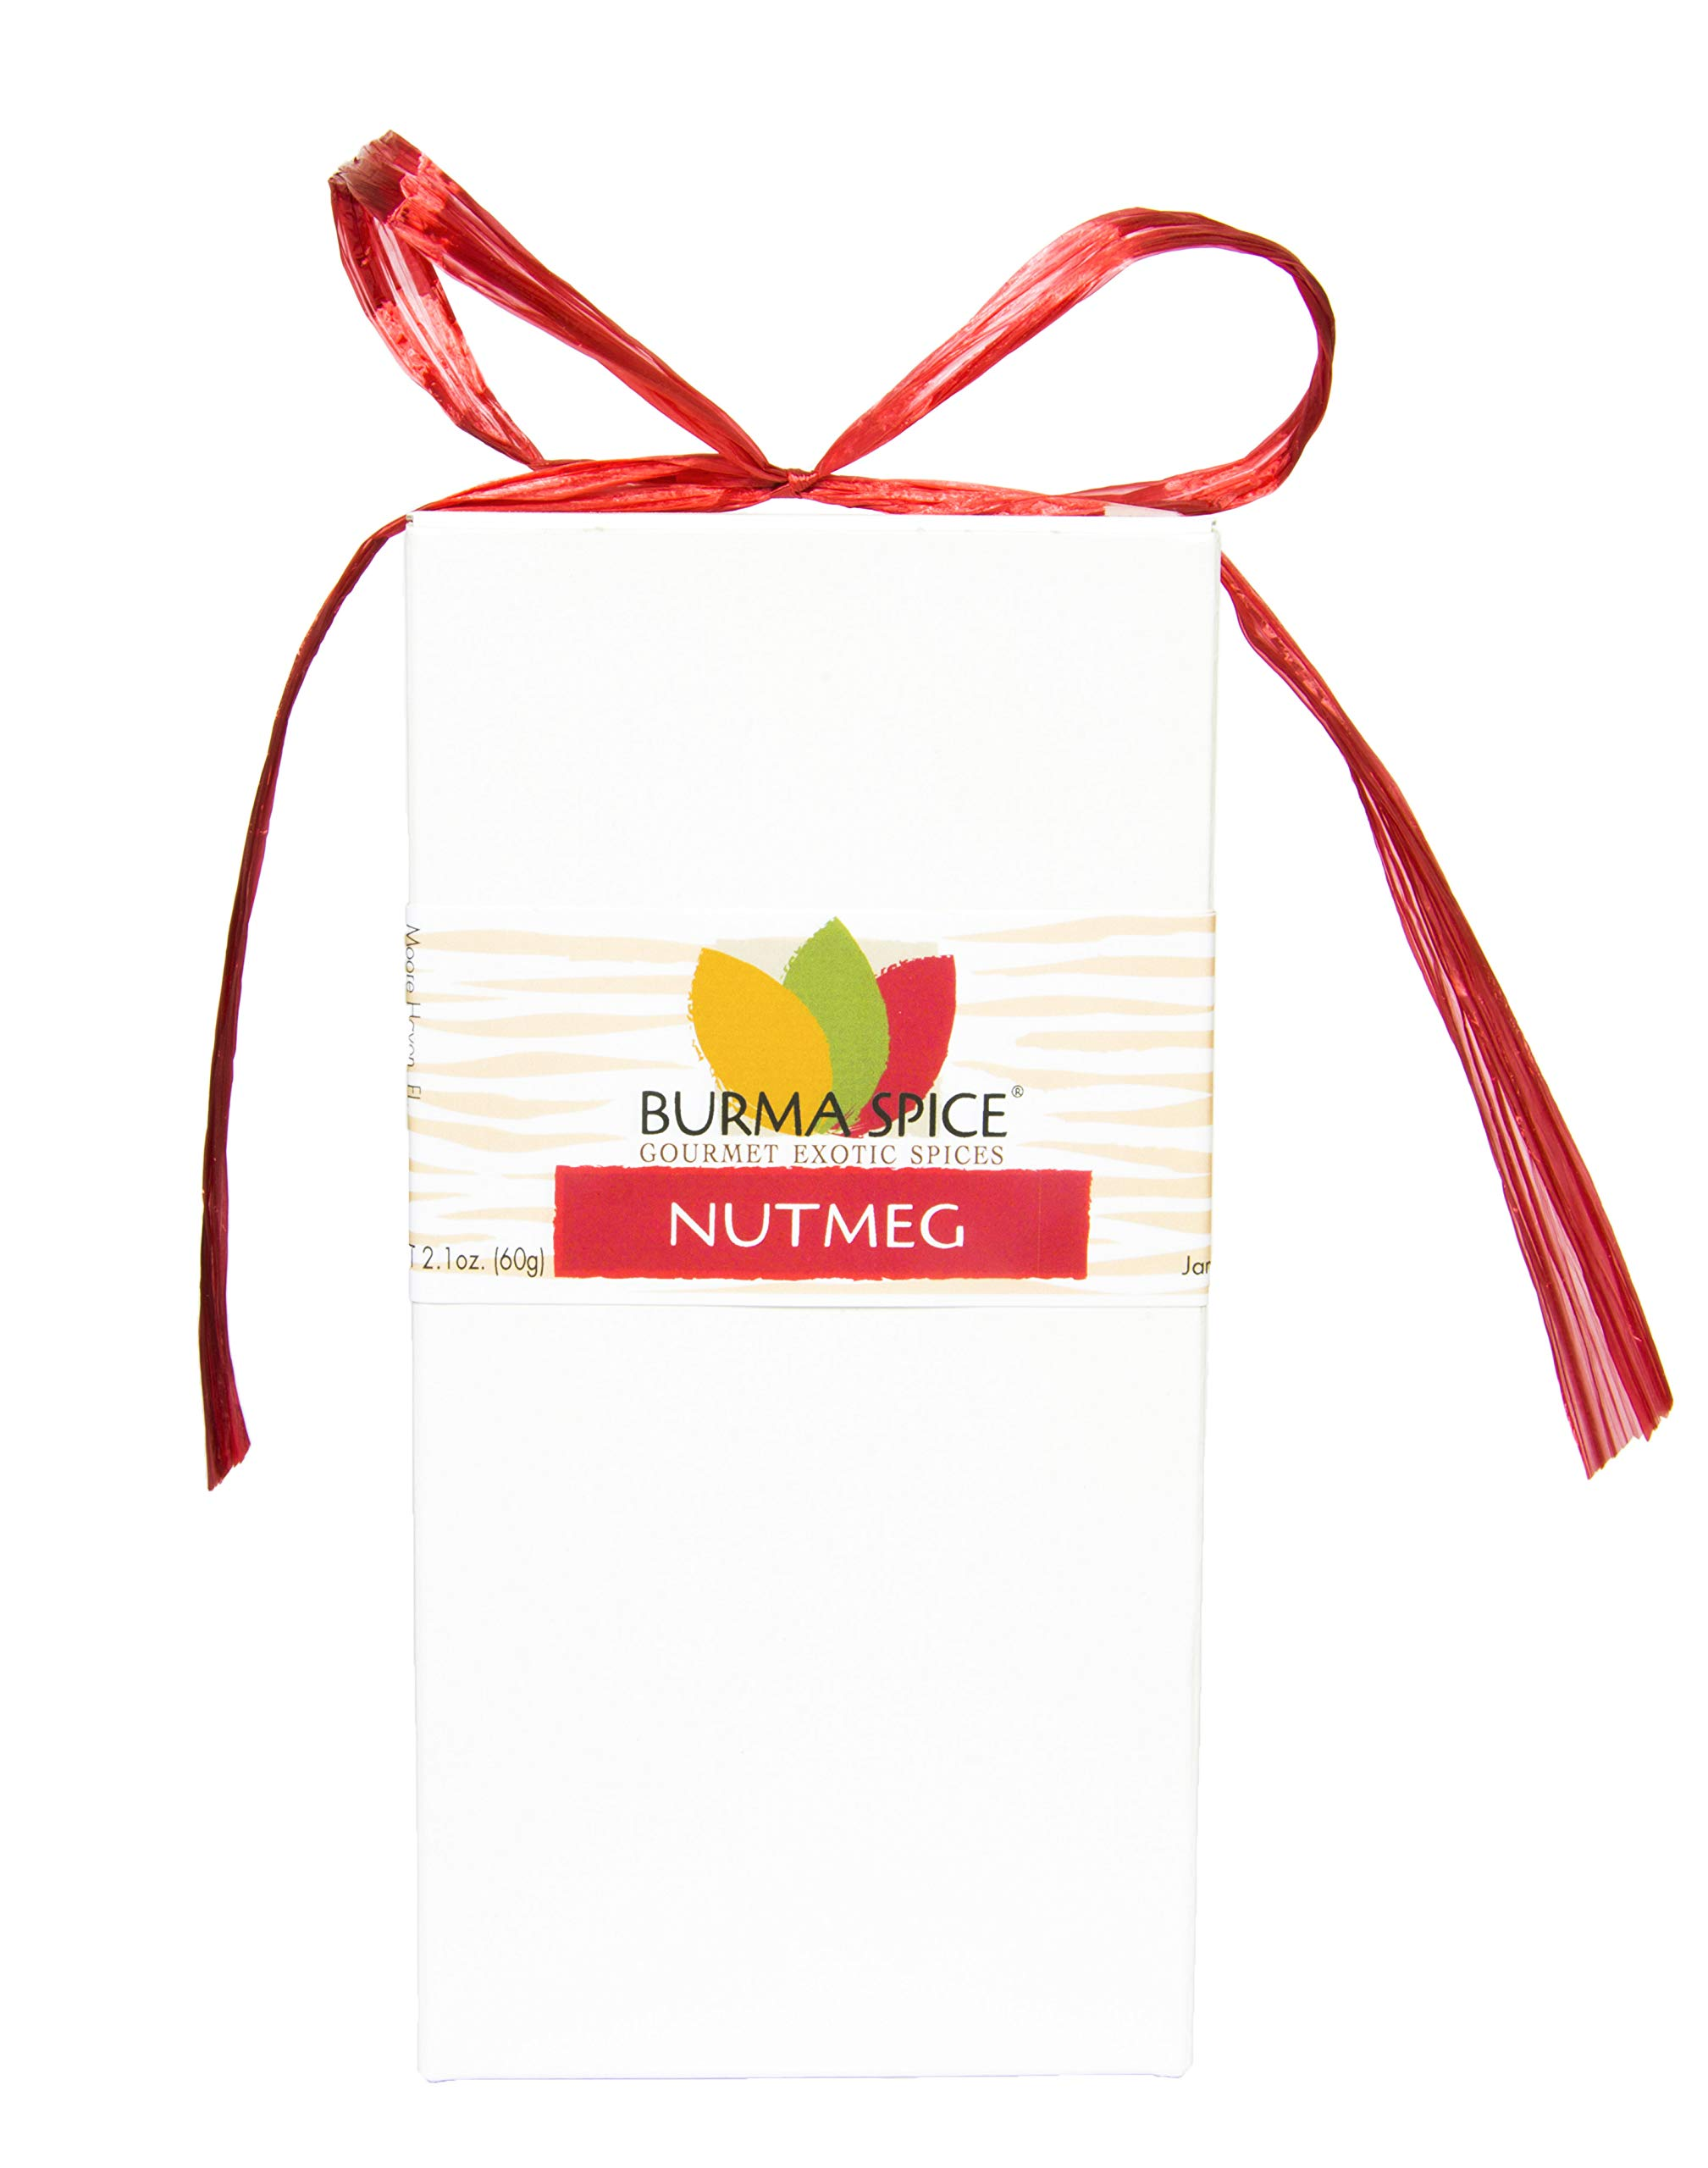 Whole Nutmeg (2.1oz.) by Burma Spice (Image #3)